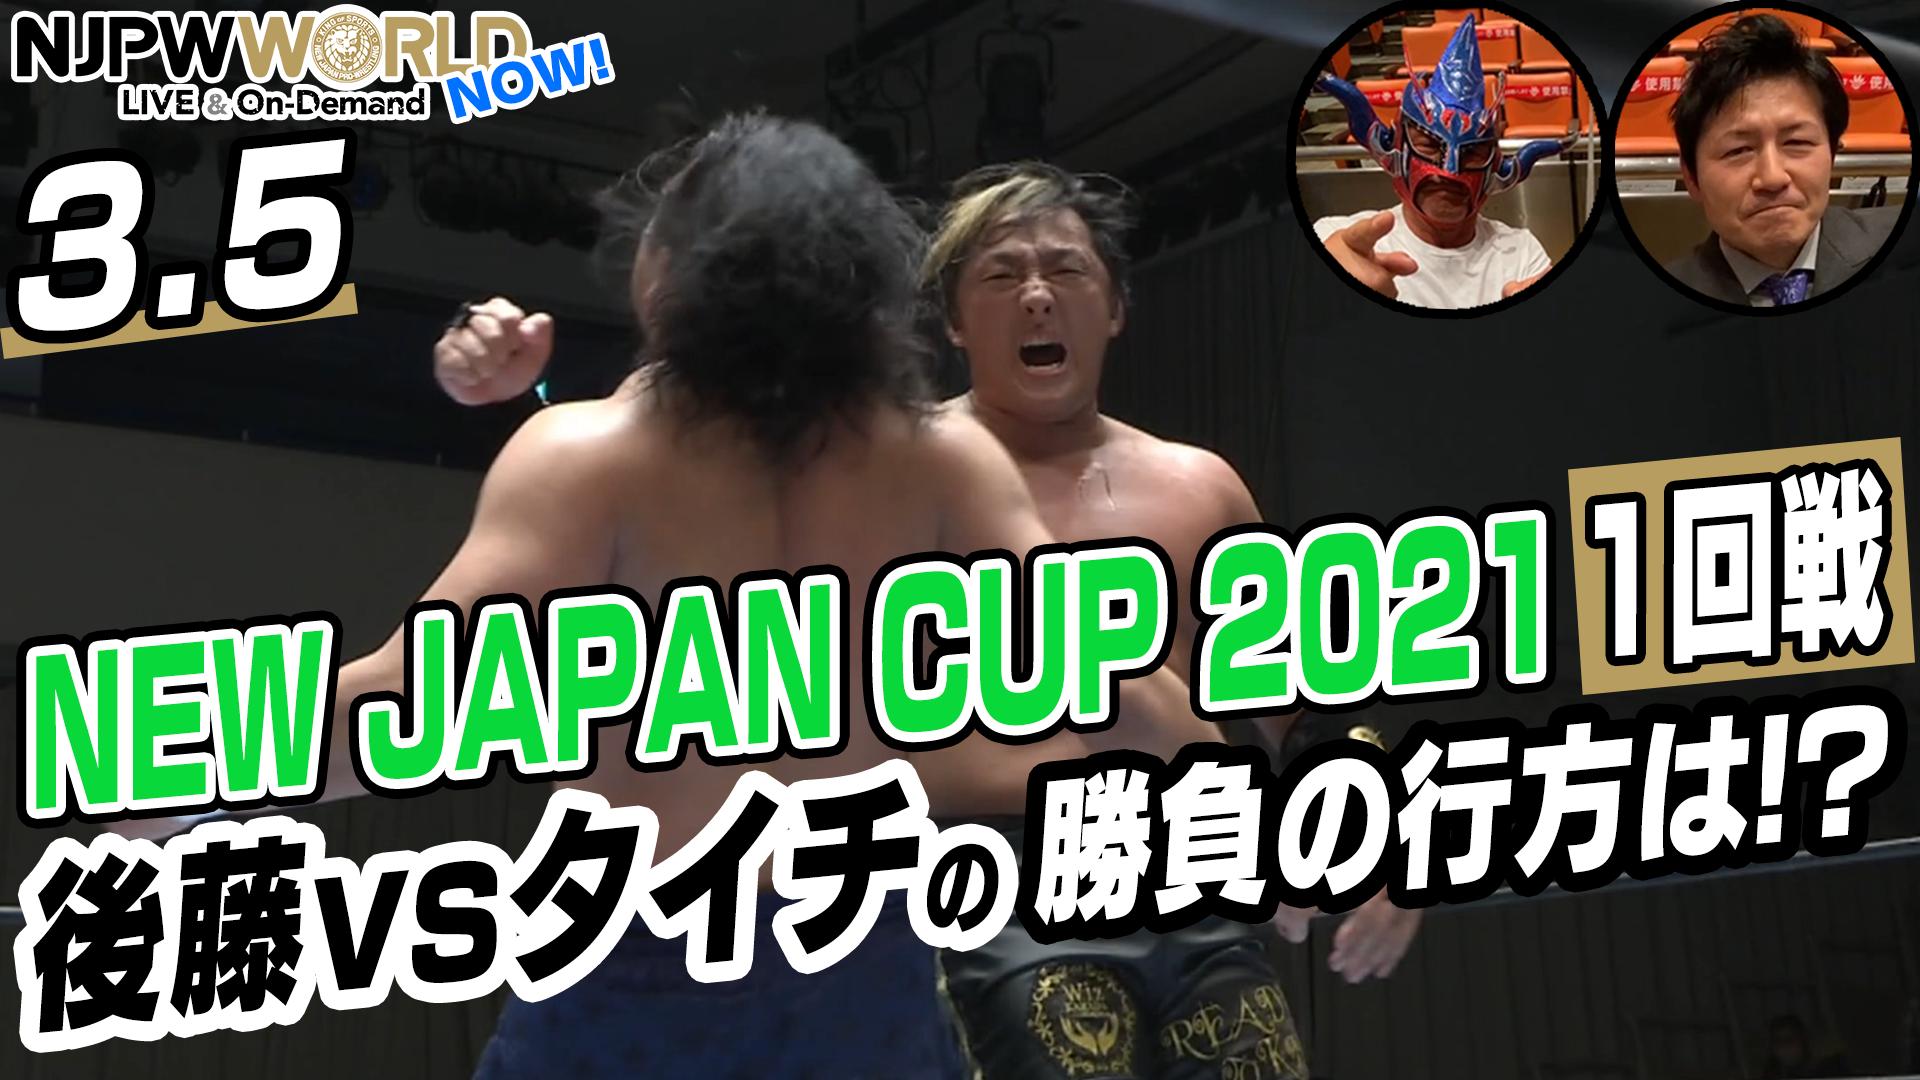 3/5【NEW JAPAN CUP 2021】1回戦 後藤vsタイチの勝負の行方は⁉️【NJPWWORLD NOW!】